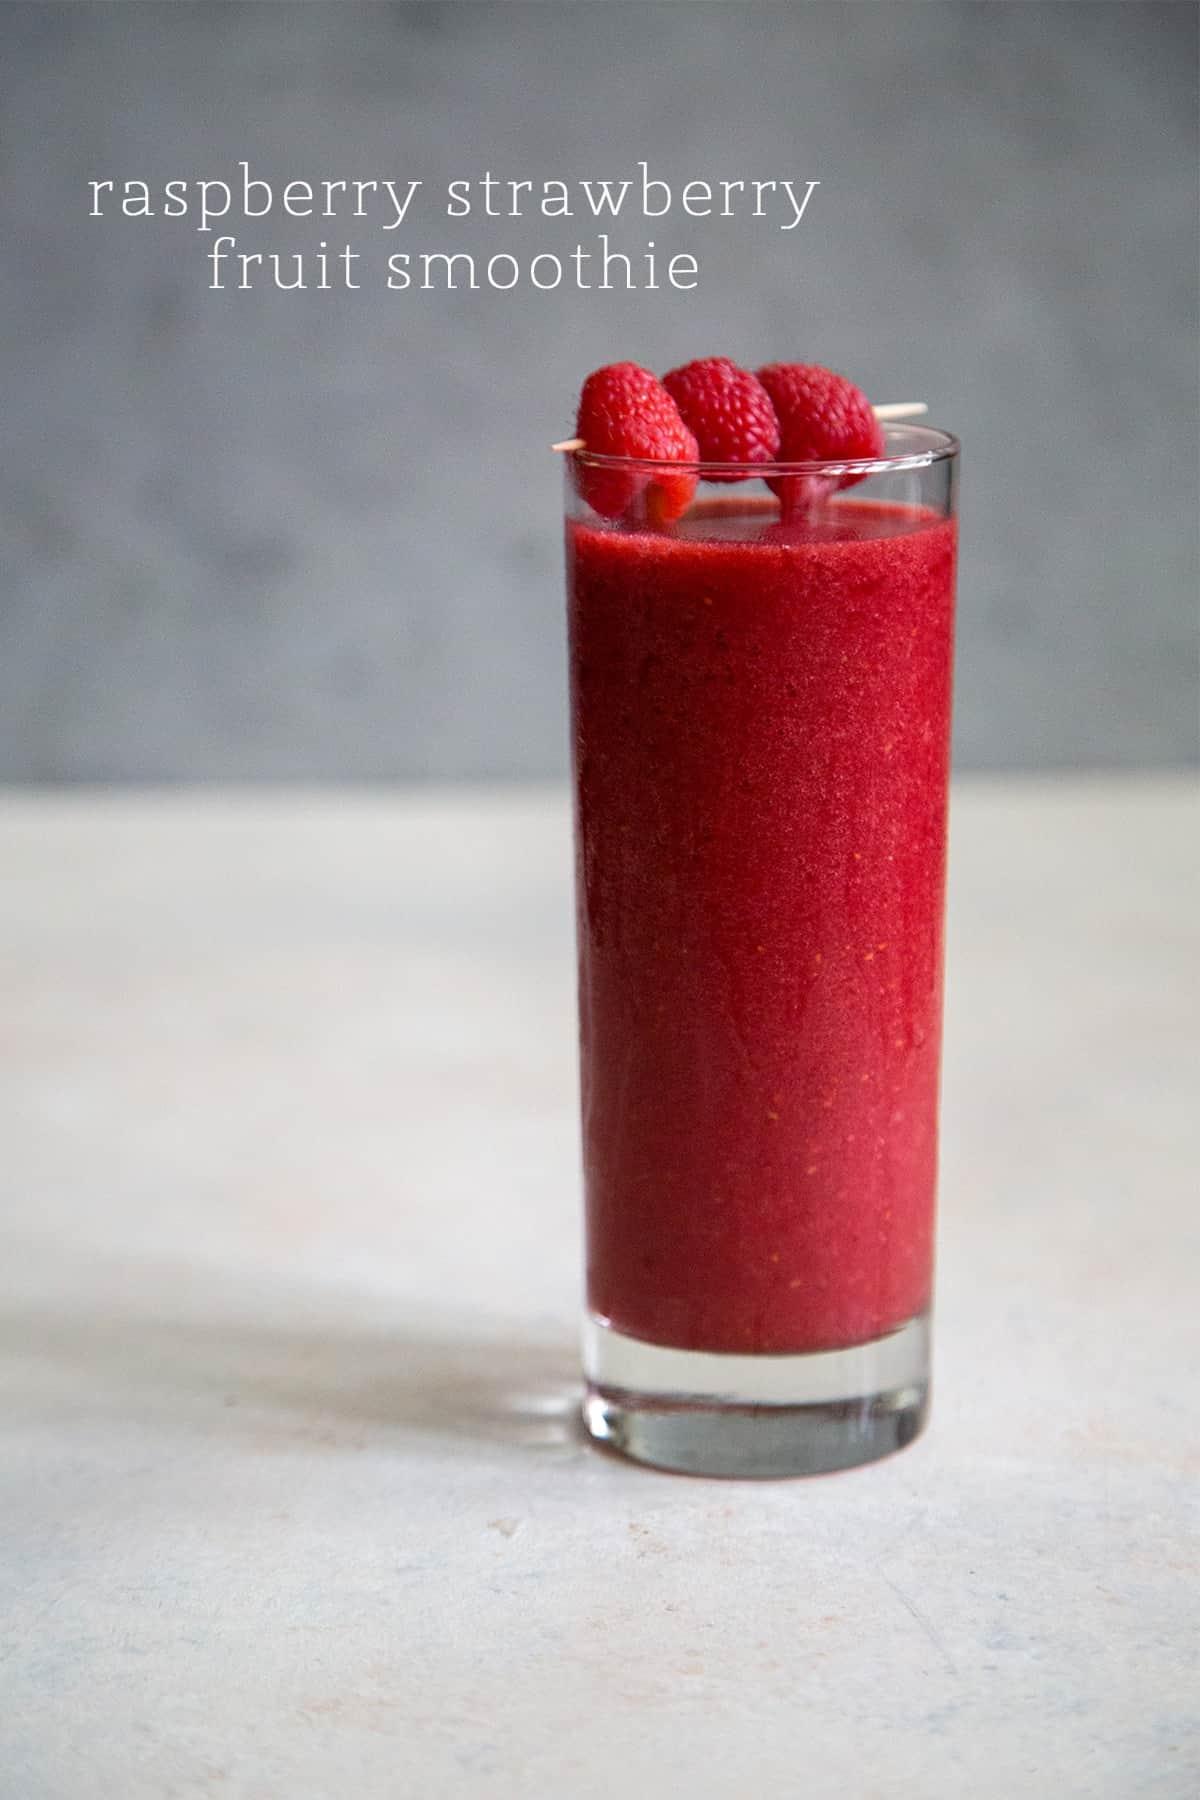 Raspberry Strawberry Fruit Smoothie